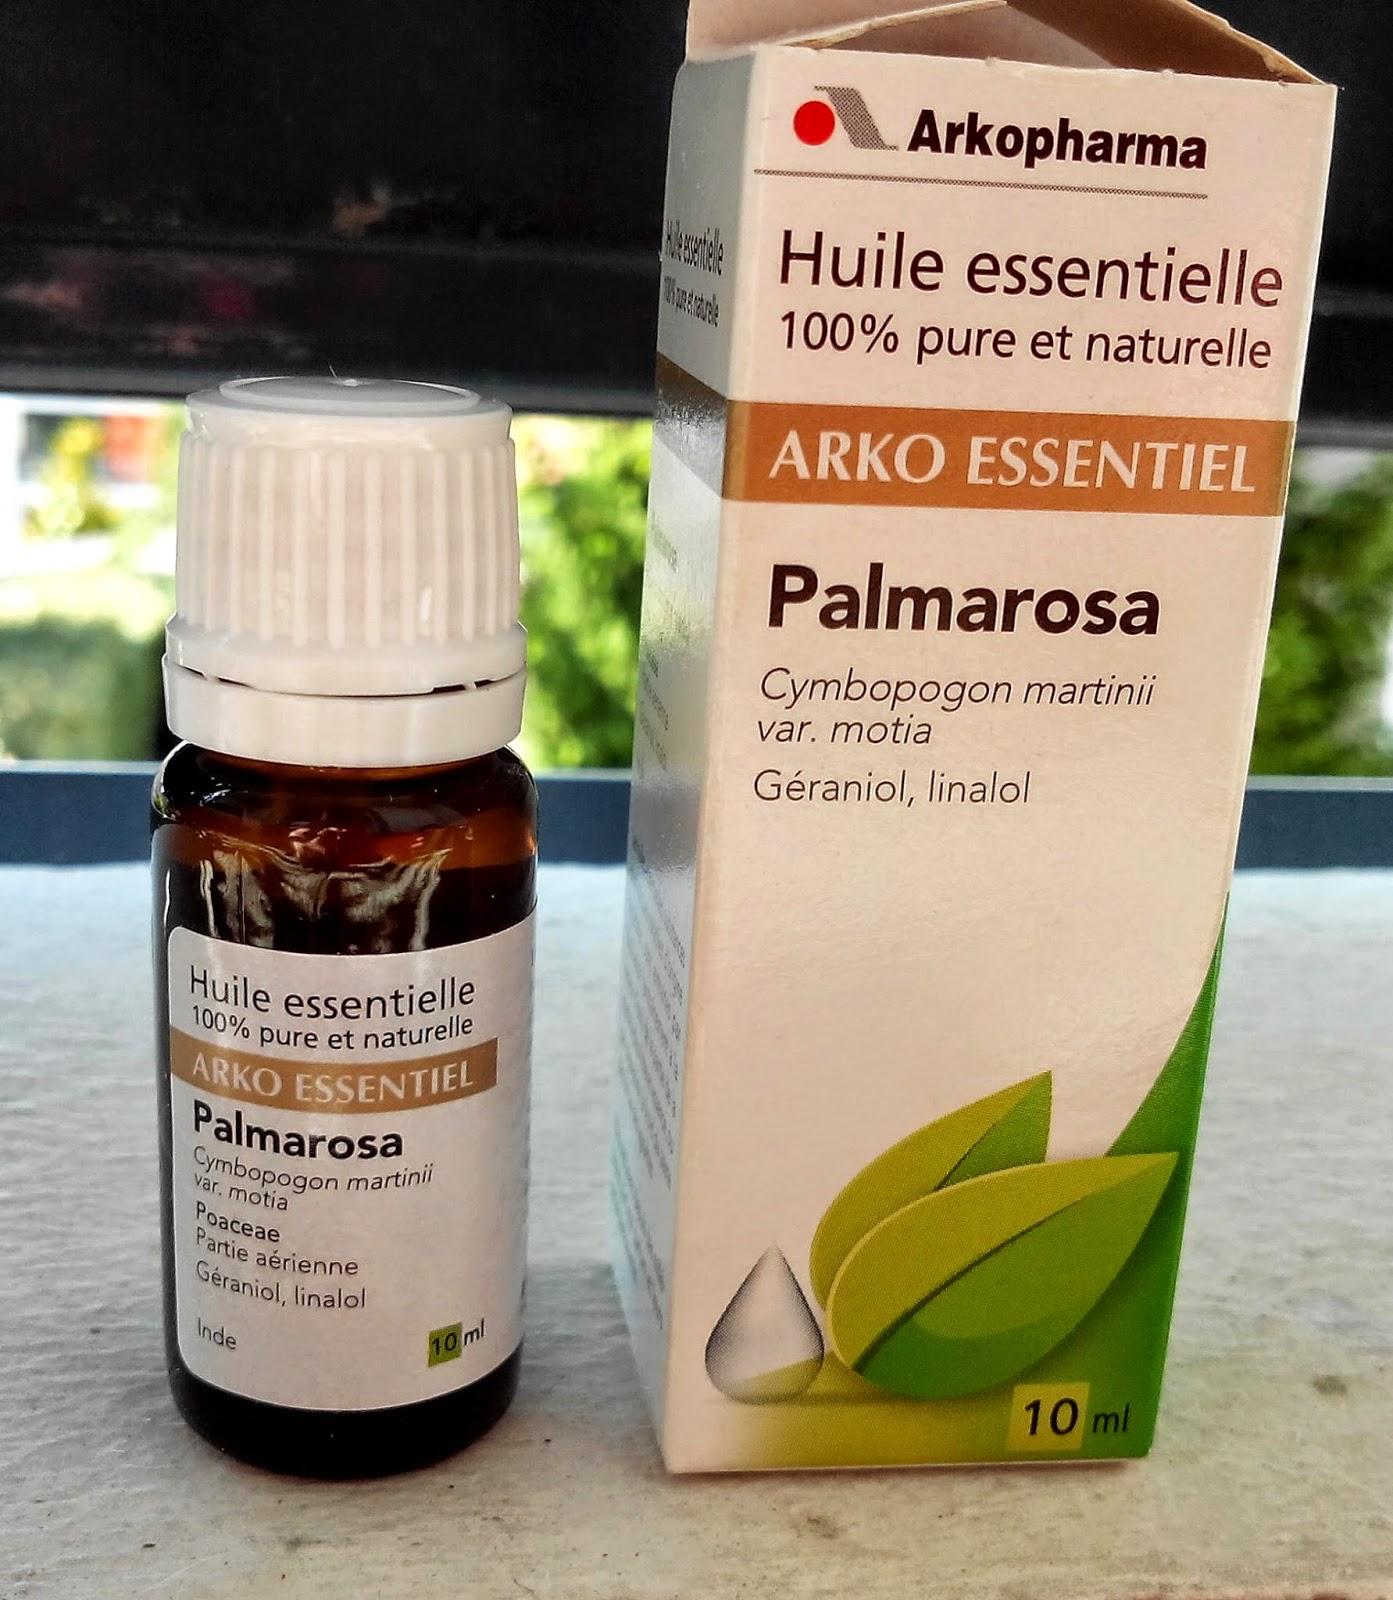 huile essentielle de Palmarosa des Laboratoires Arkopharma BullElodie